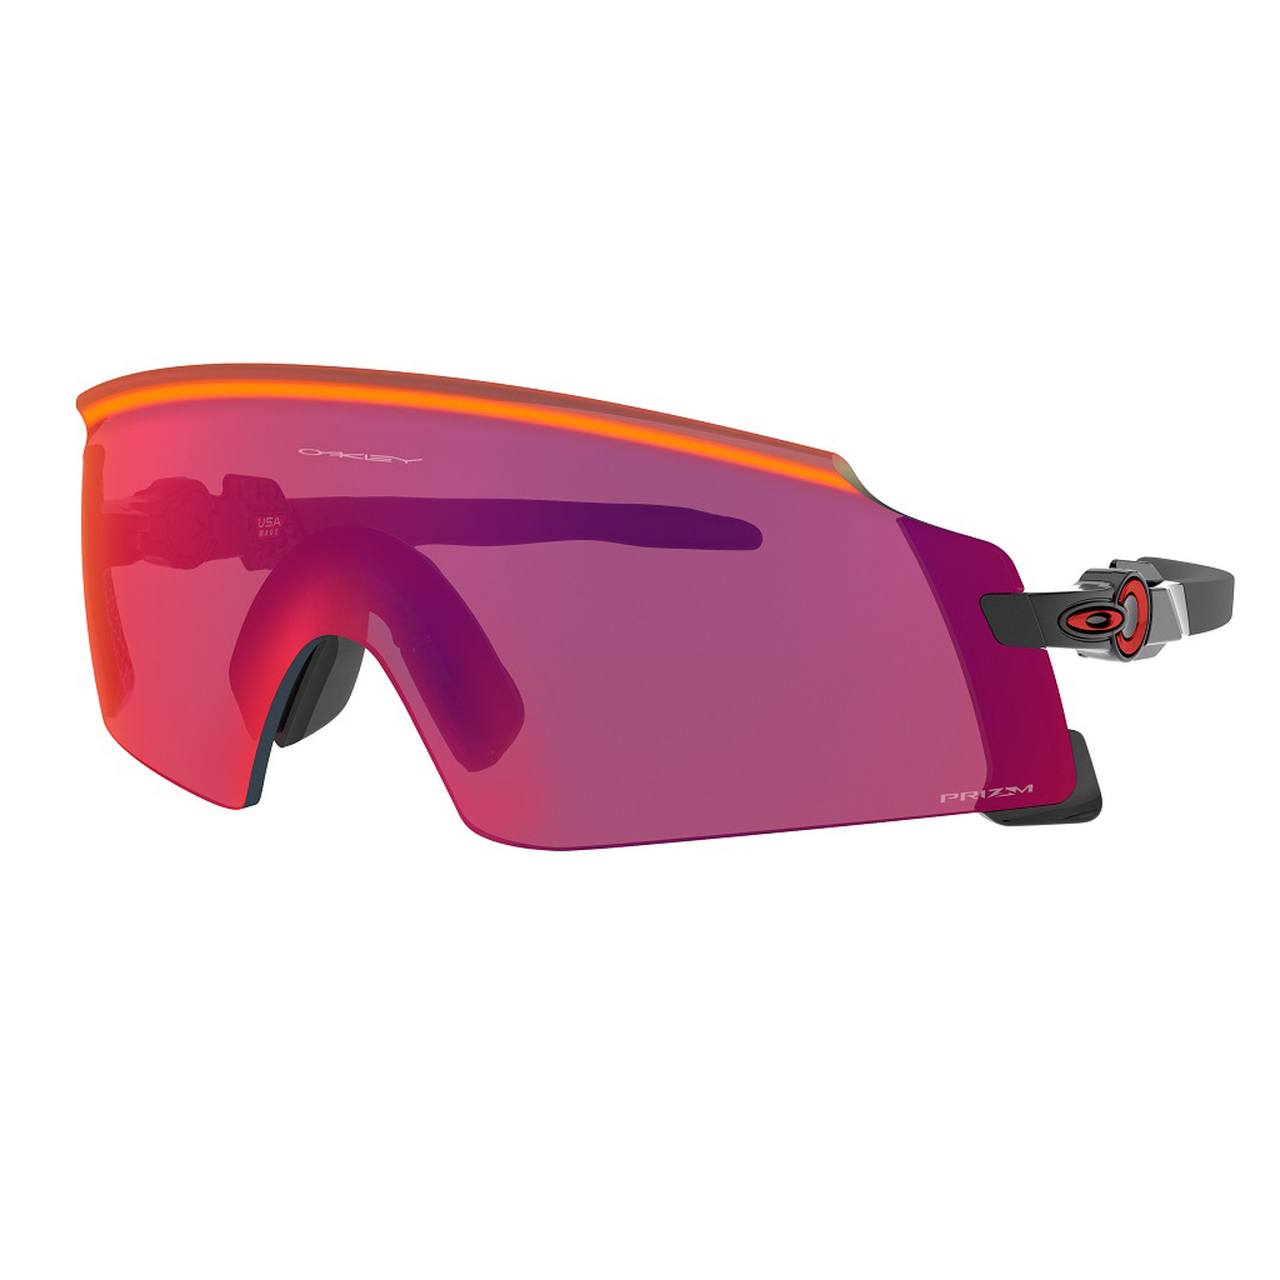 Polished Black w/ Prizm Road - Oakley Kato X Sunglasses